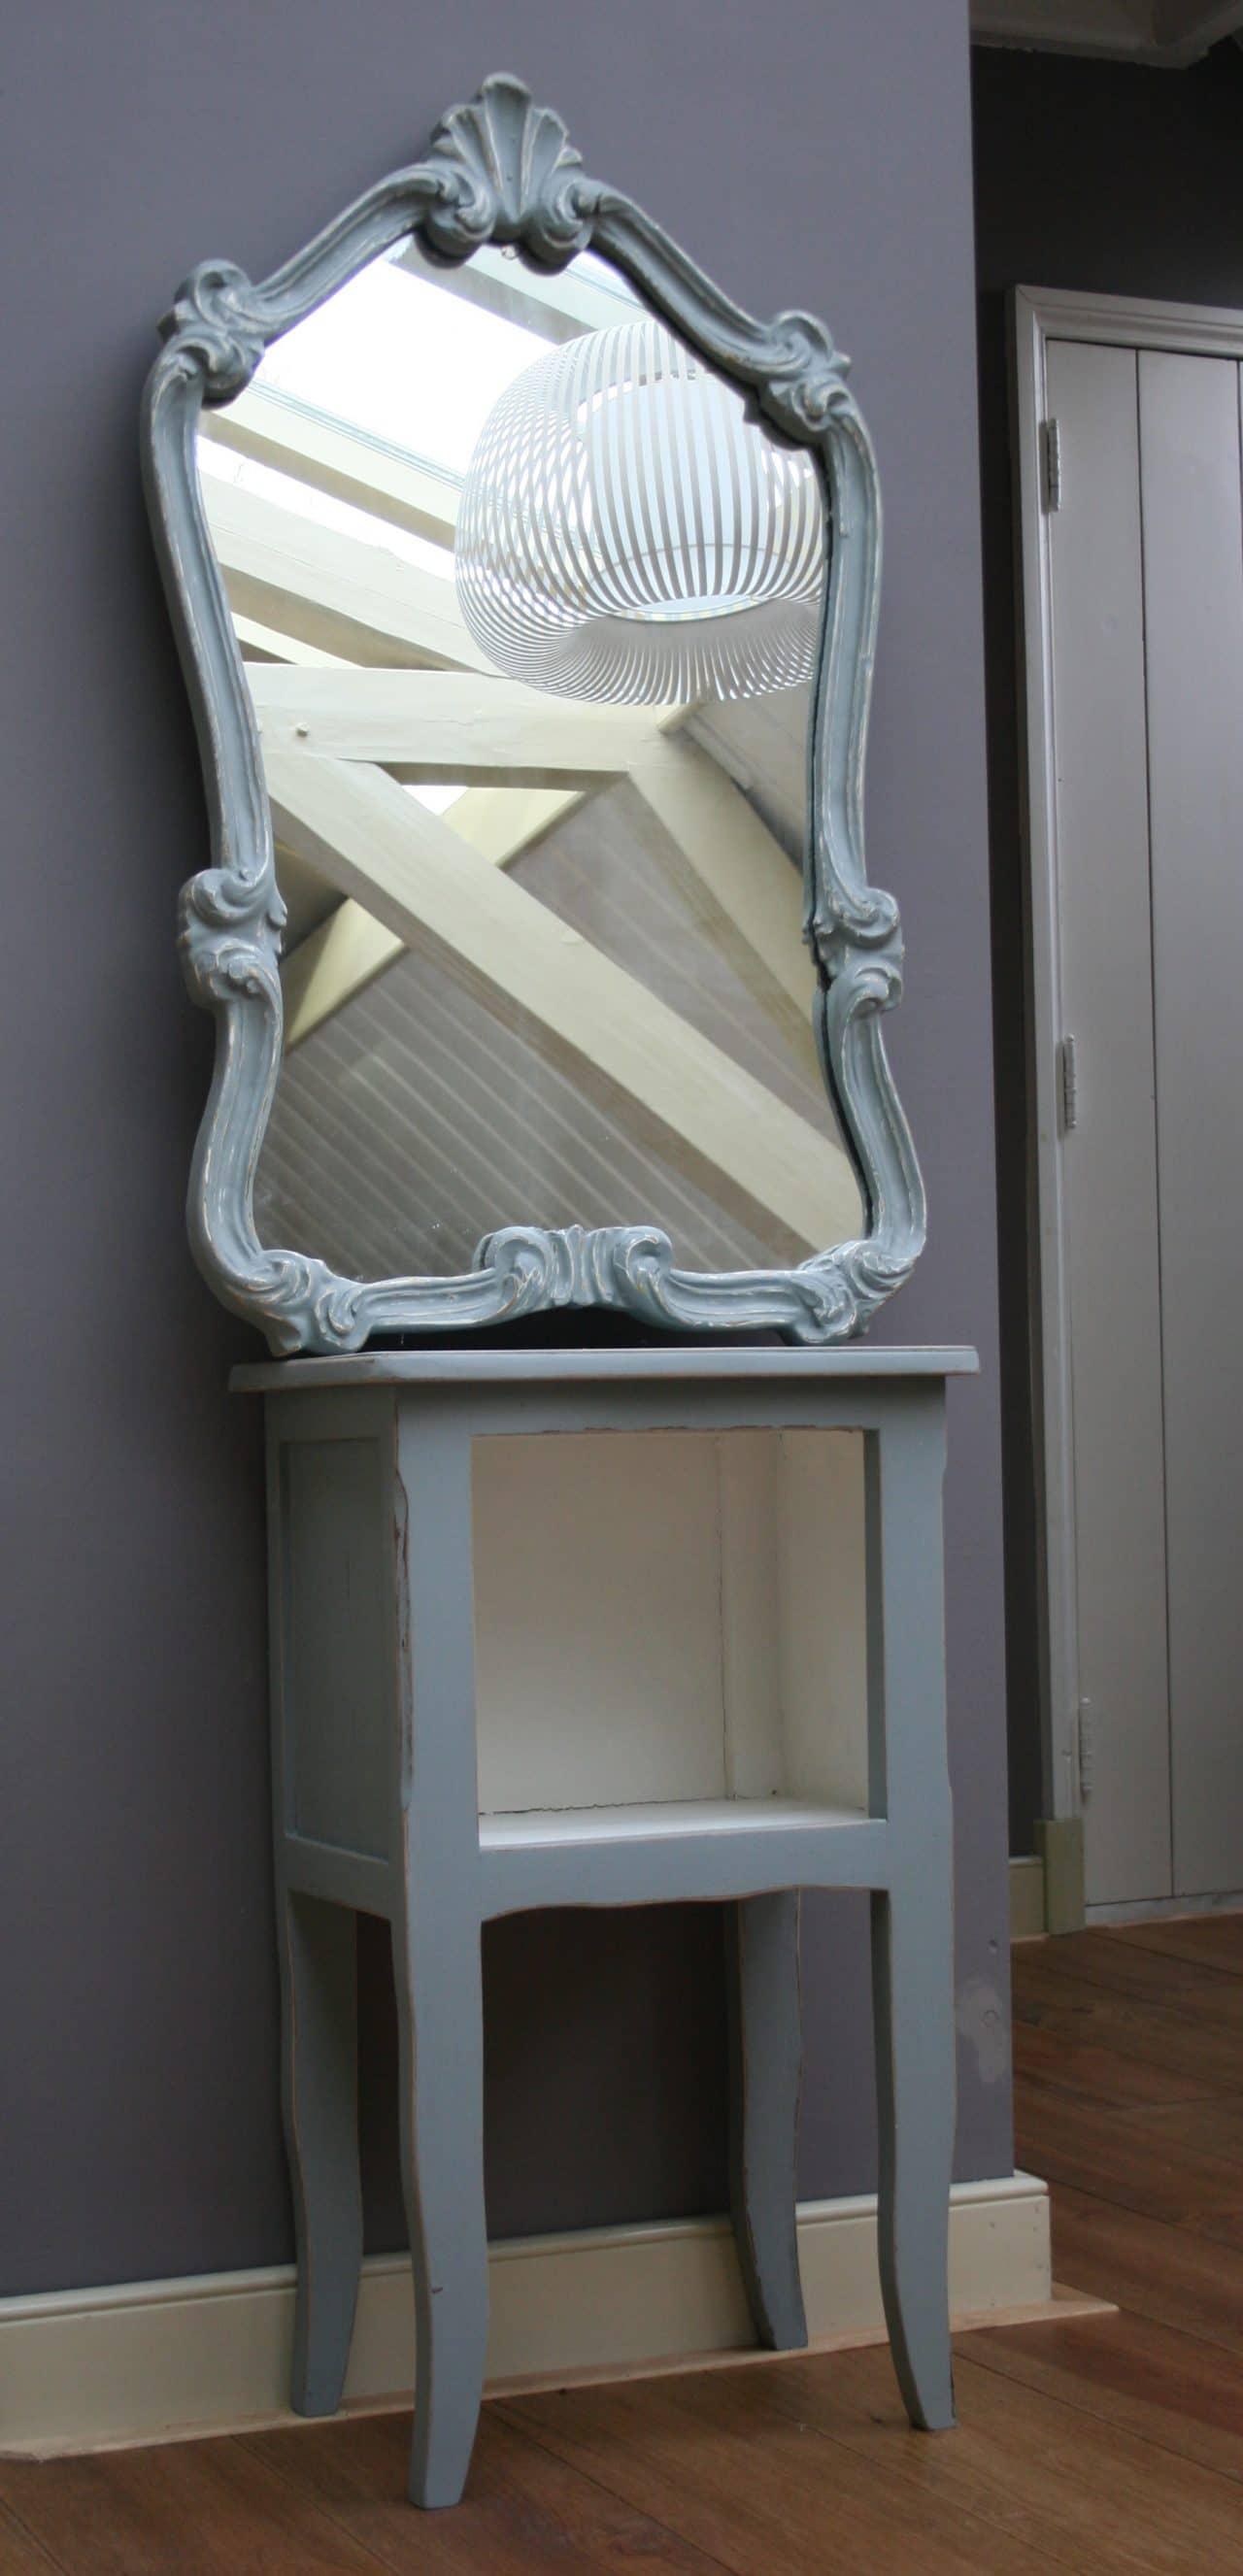 Sidetable Met Bijpassende Spiegel.Nachtkastje En Bijpassende Spiegel